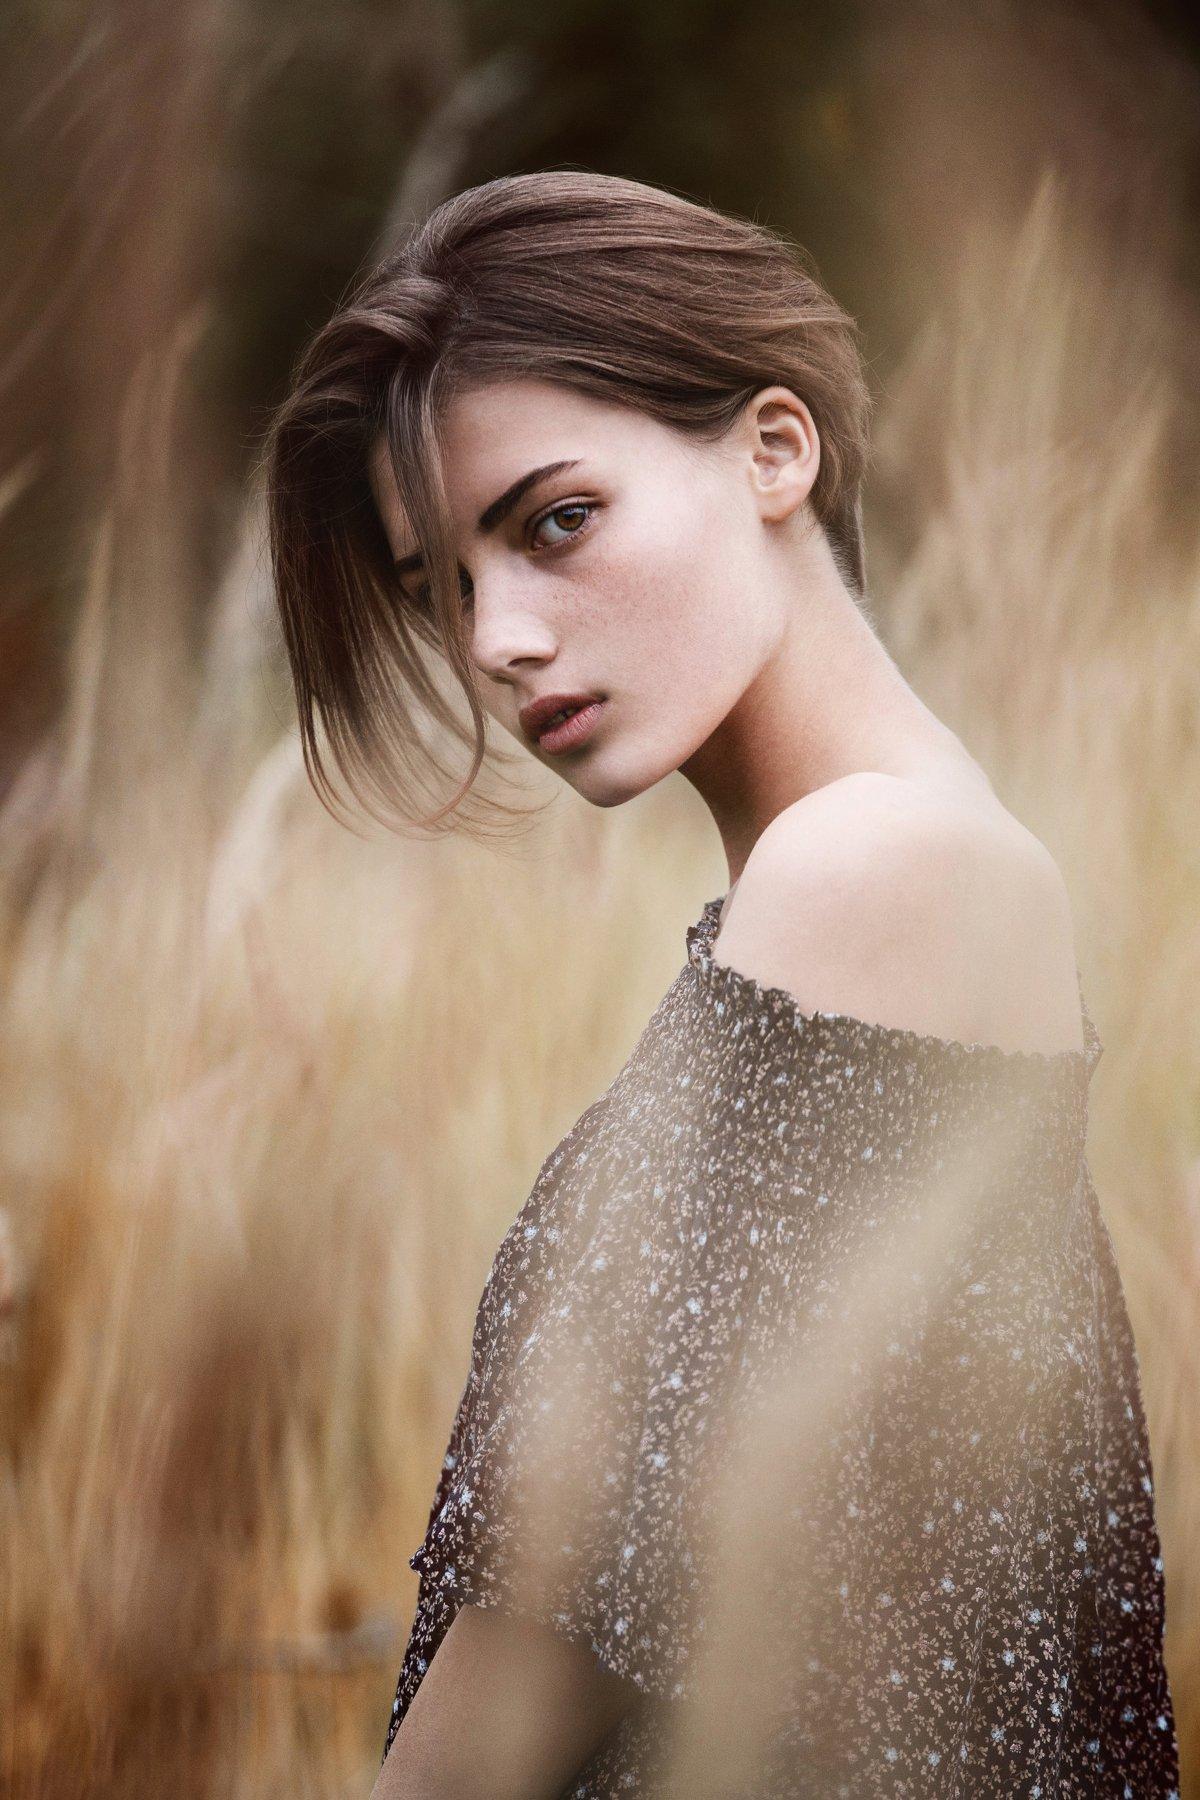 глаза, веснушки, поле, природа, девушка,лето,eyes, freckles, field, nature, girl, summer, Александра Маркварт